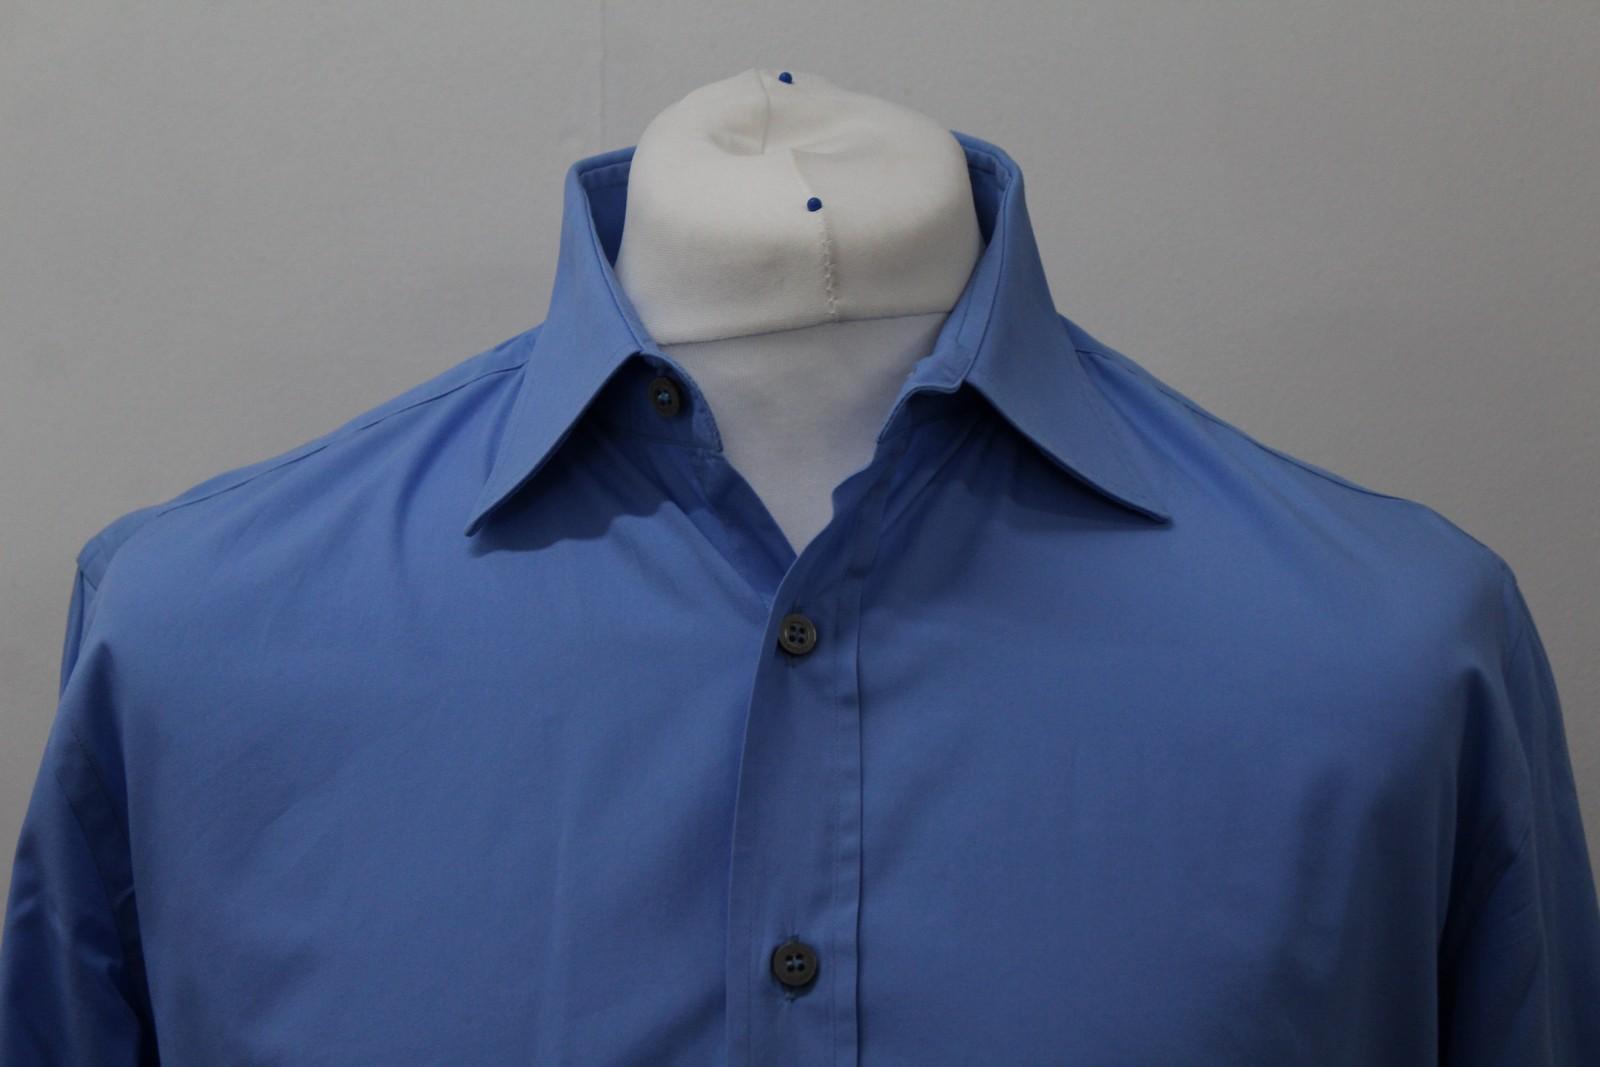 Paul-Smith-Hombres-Azul-Algodon-Mangas-Largas-Camisa-De-Puno-Doble-Cuello-16-5-034-42cm miniatura 3